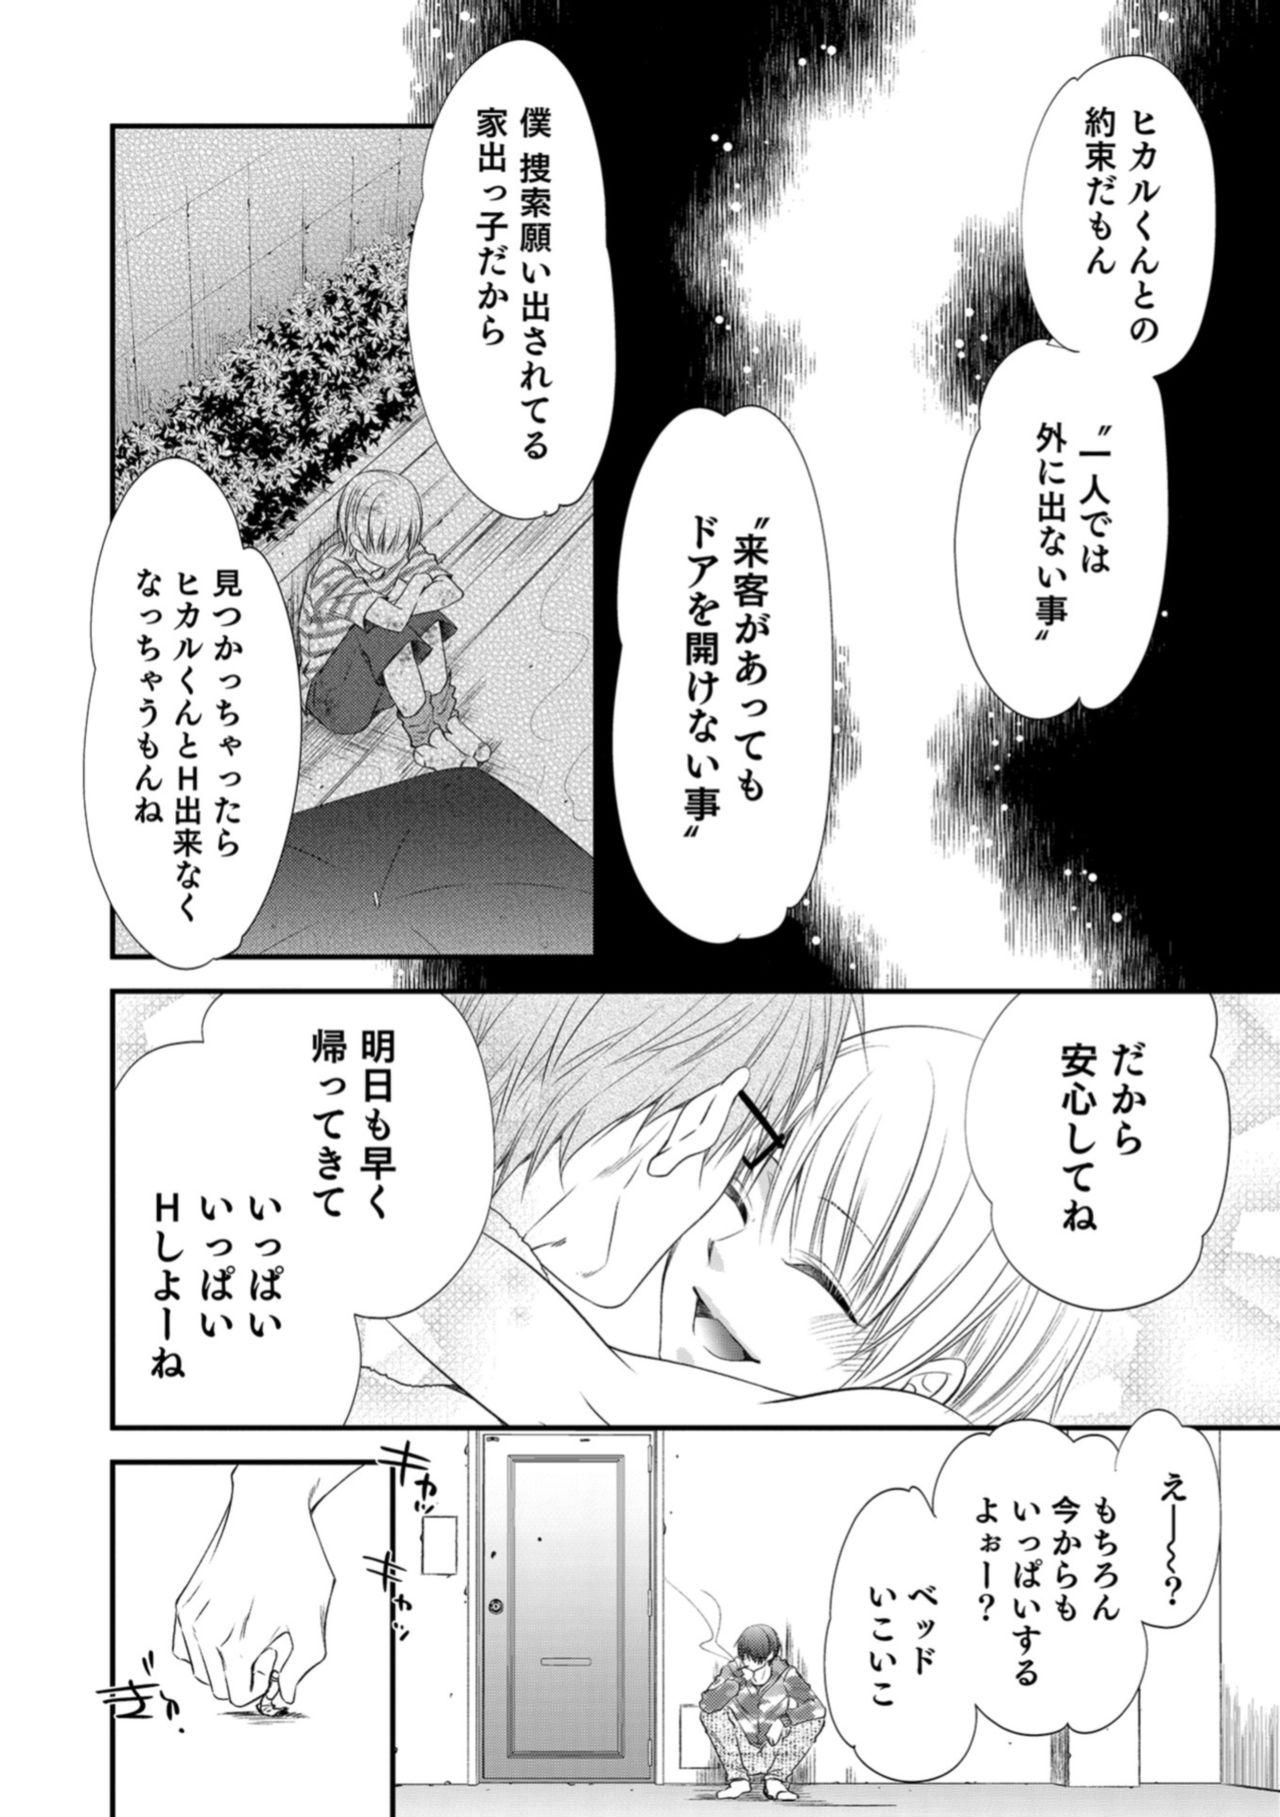 Otokonoko HELL'S GATE #03 99